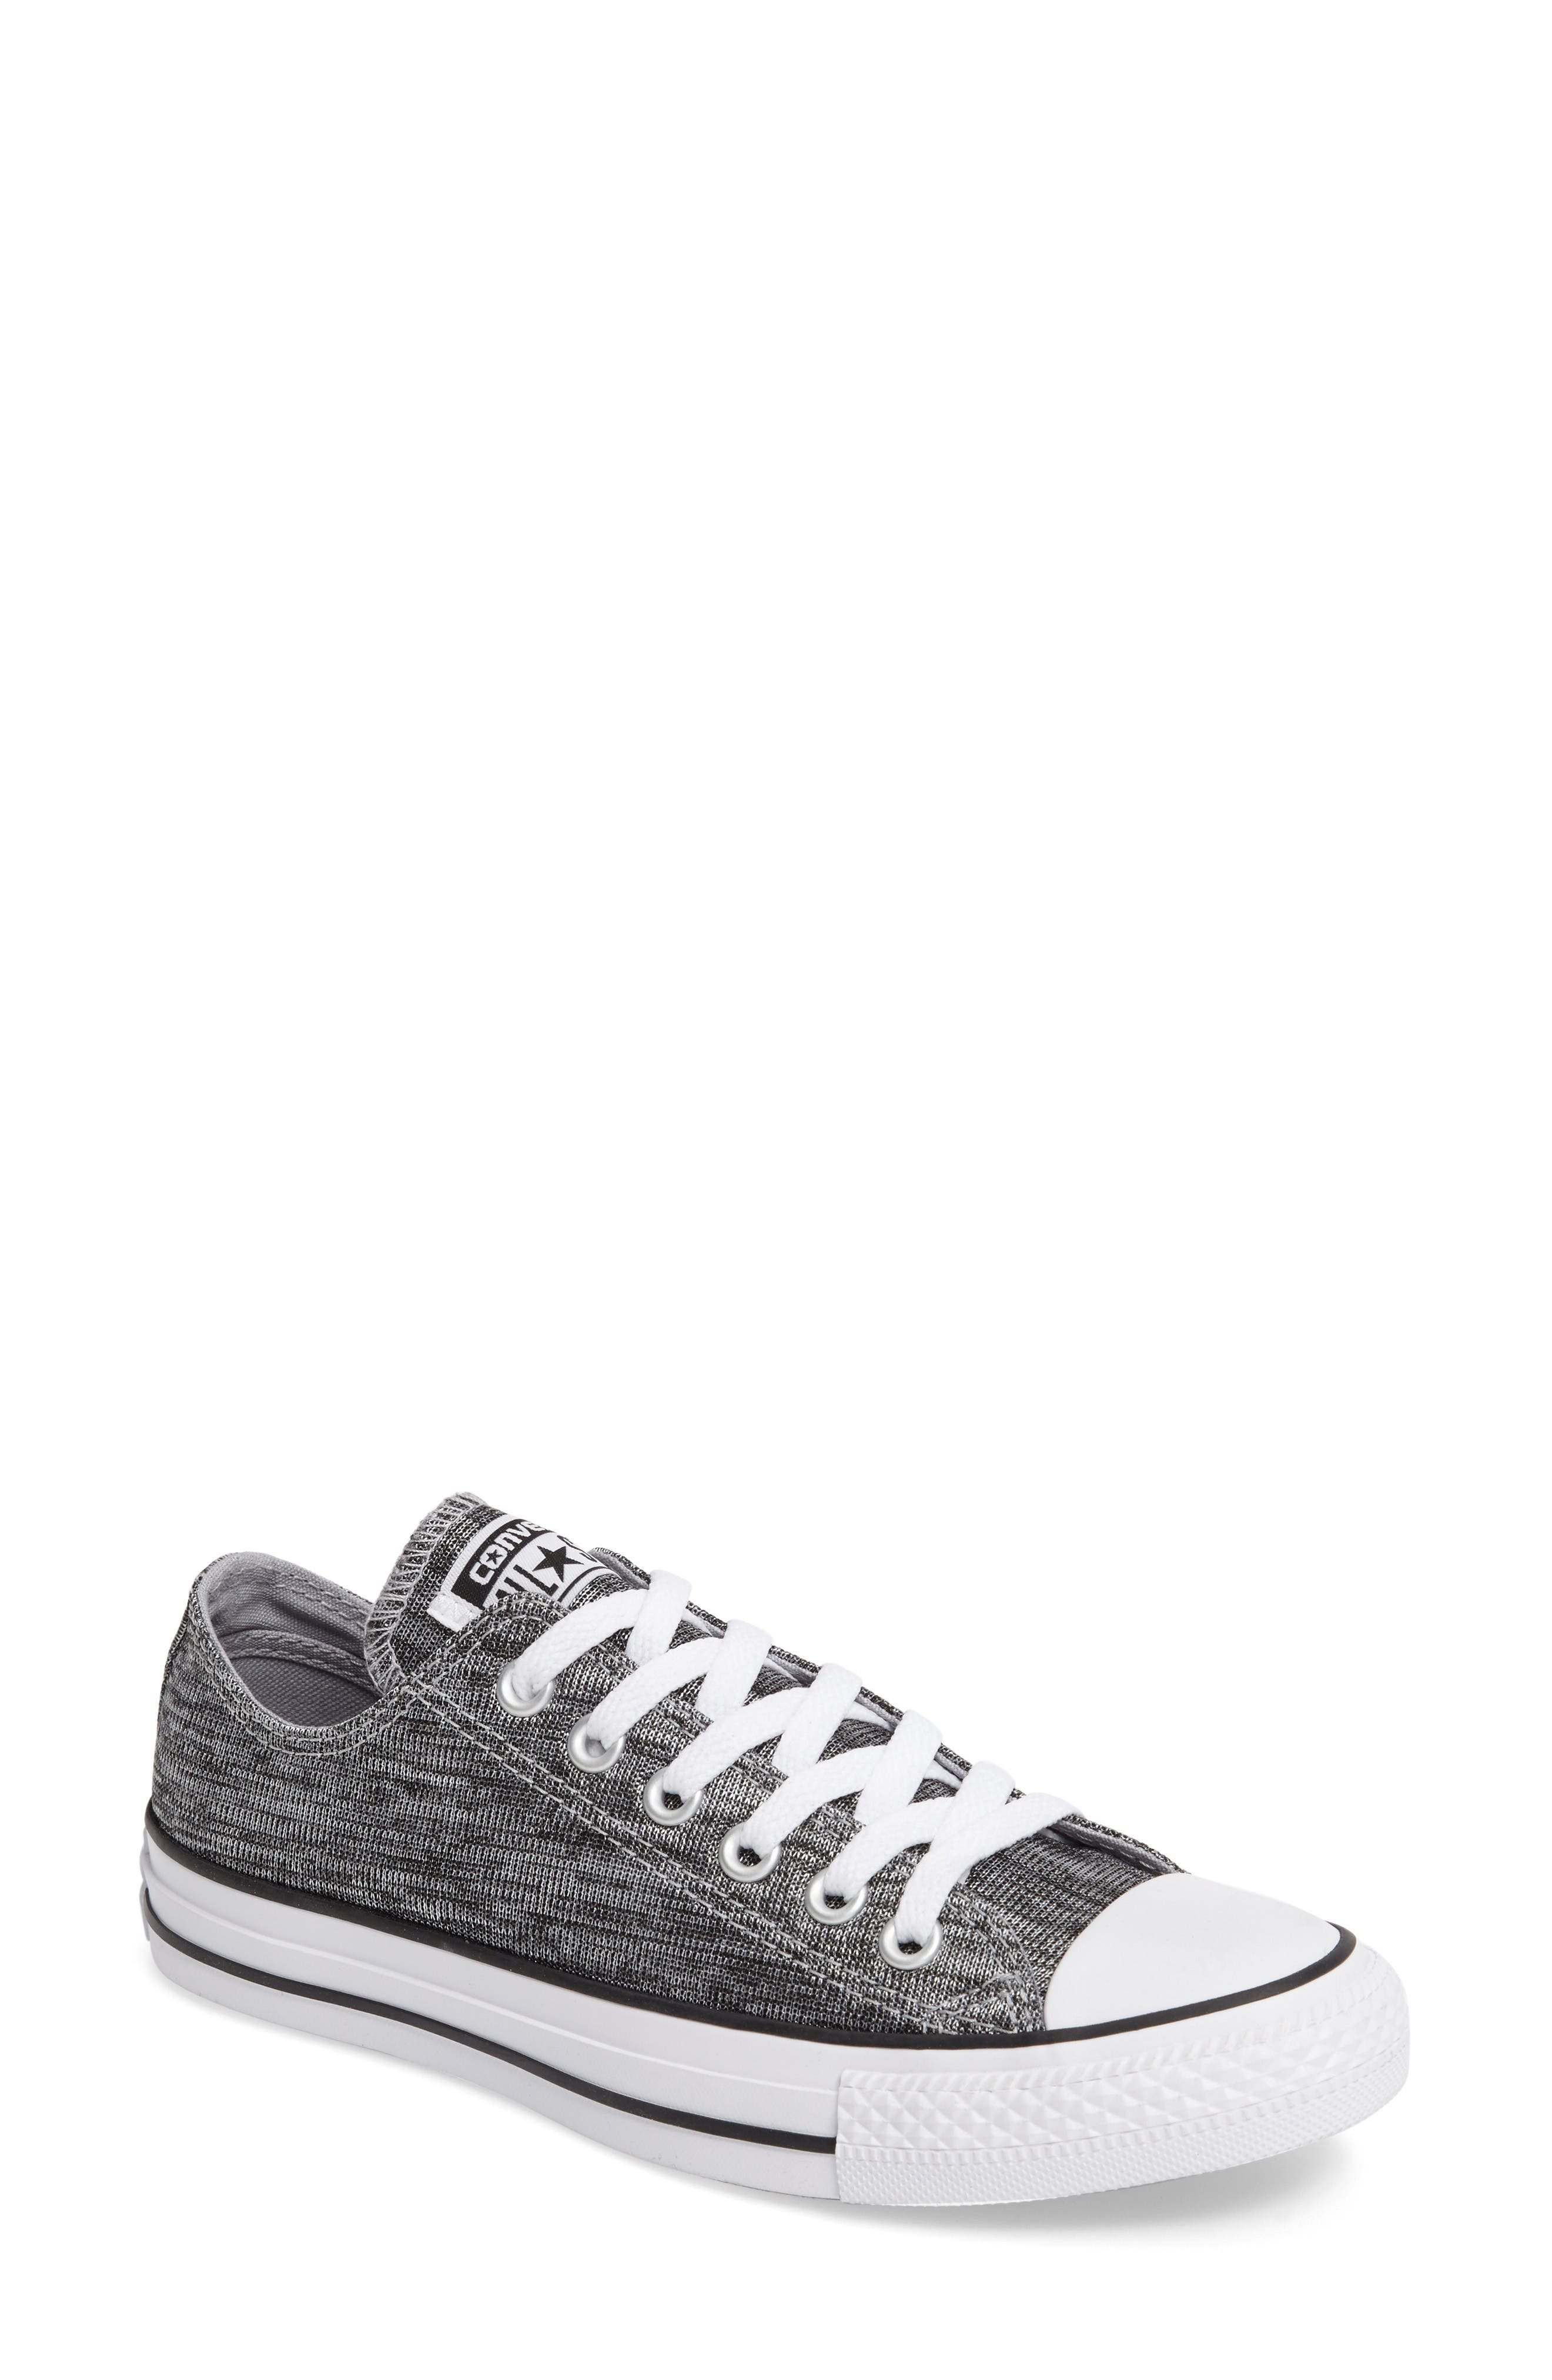 converse womens. converse chuck taylor® all star® knit low top sneaker (women) womens e